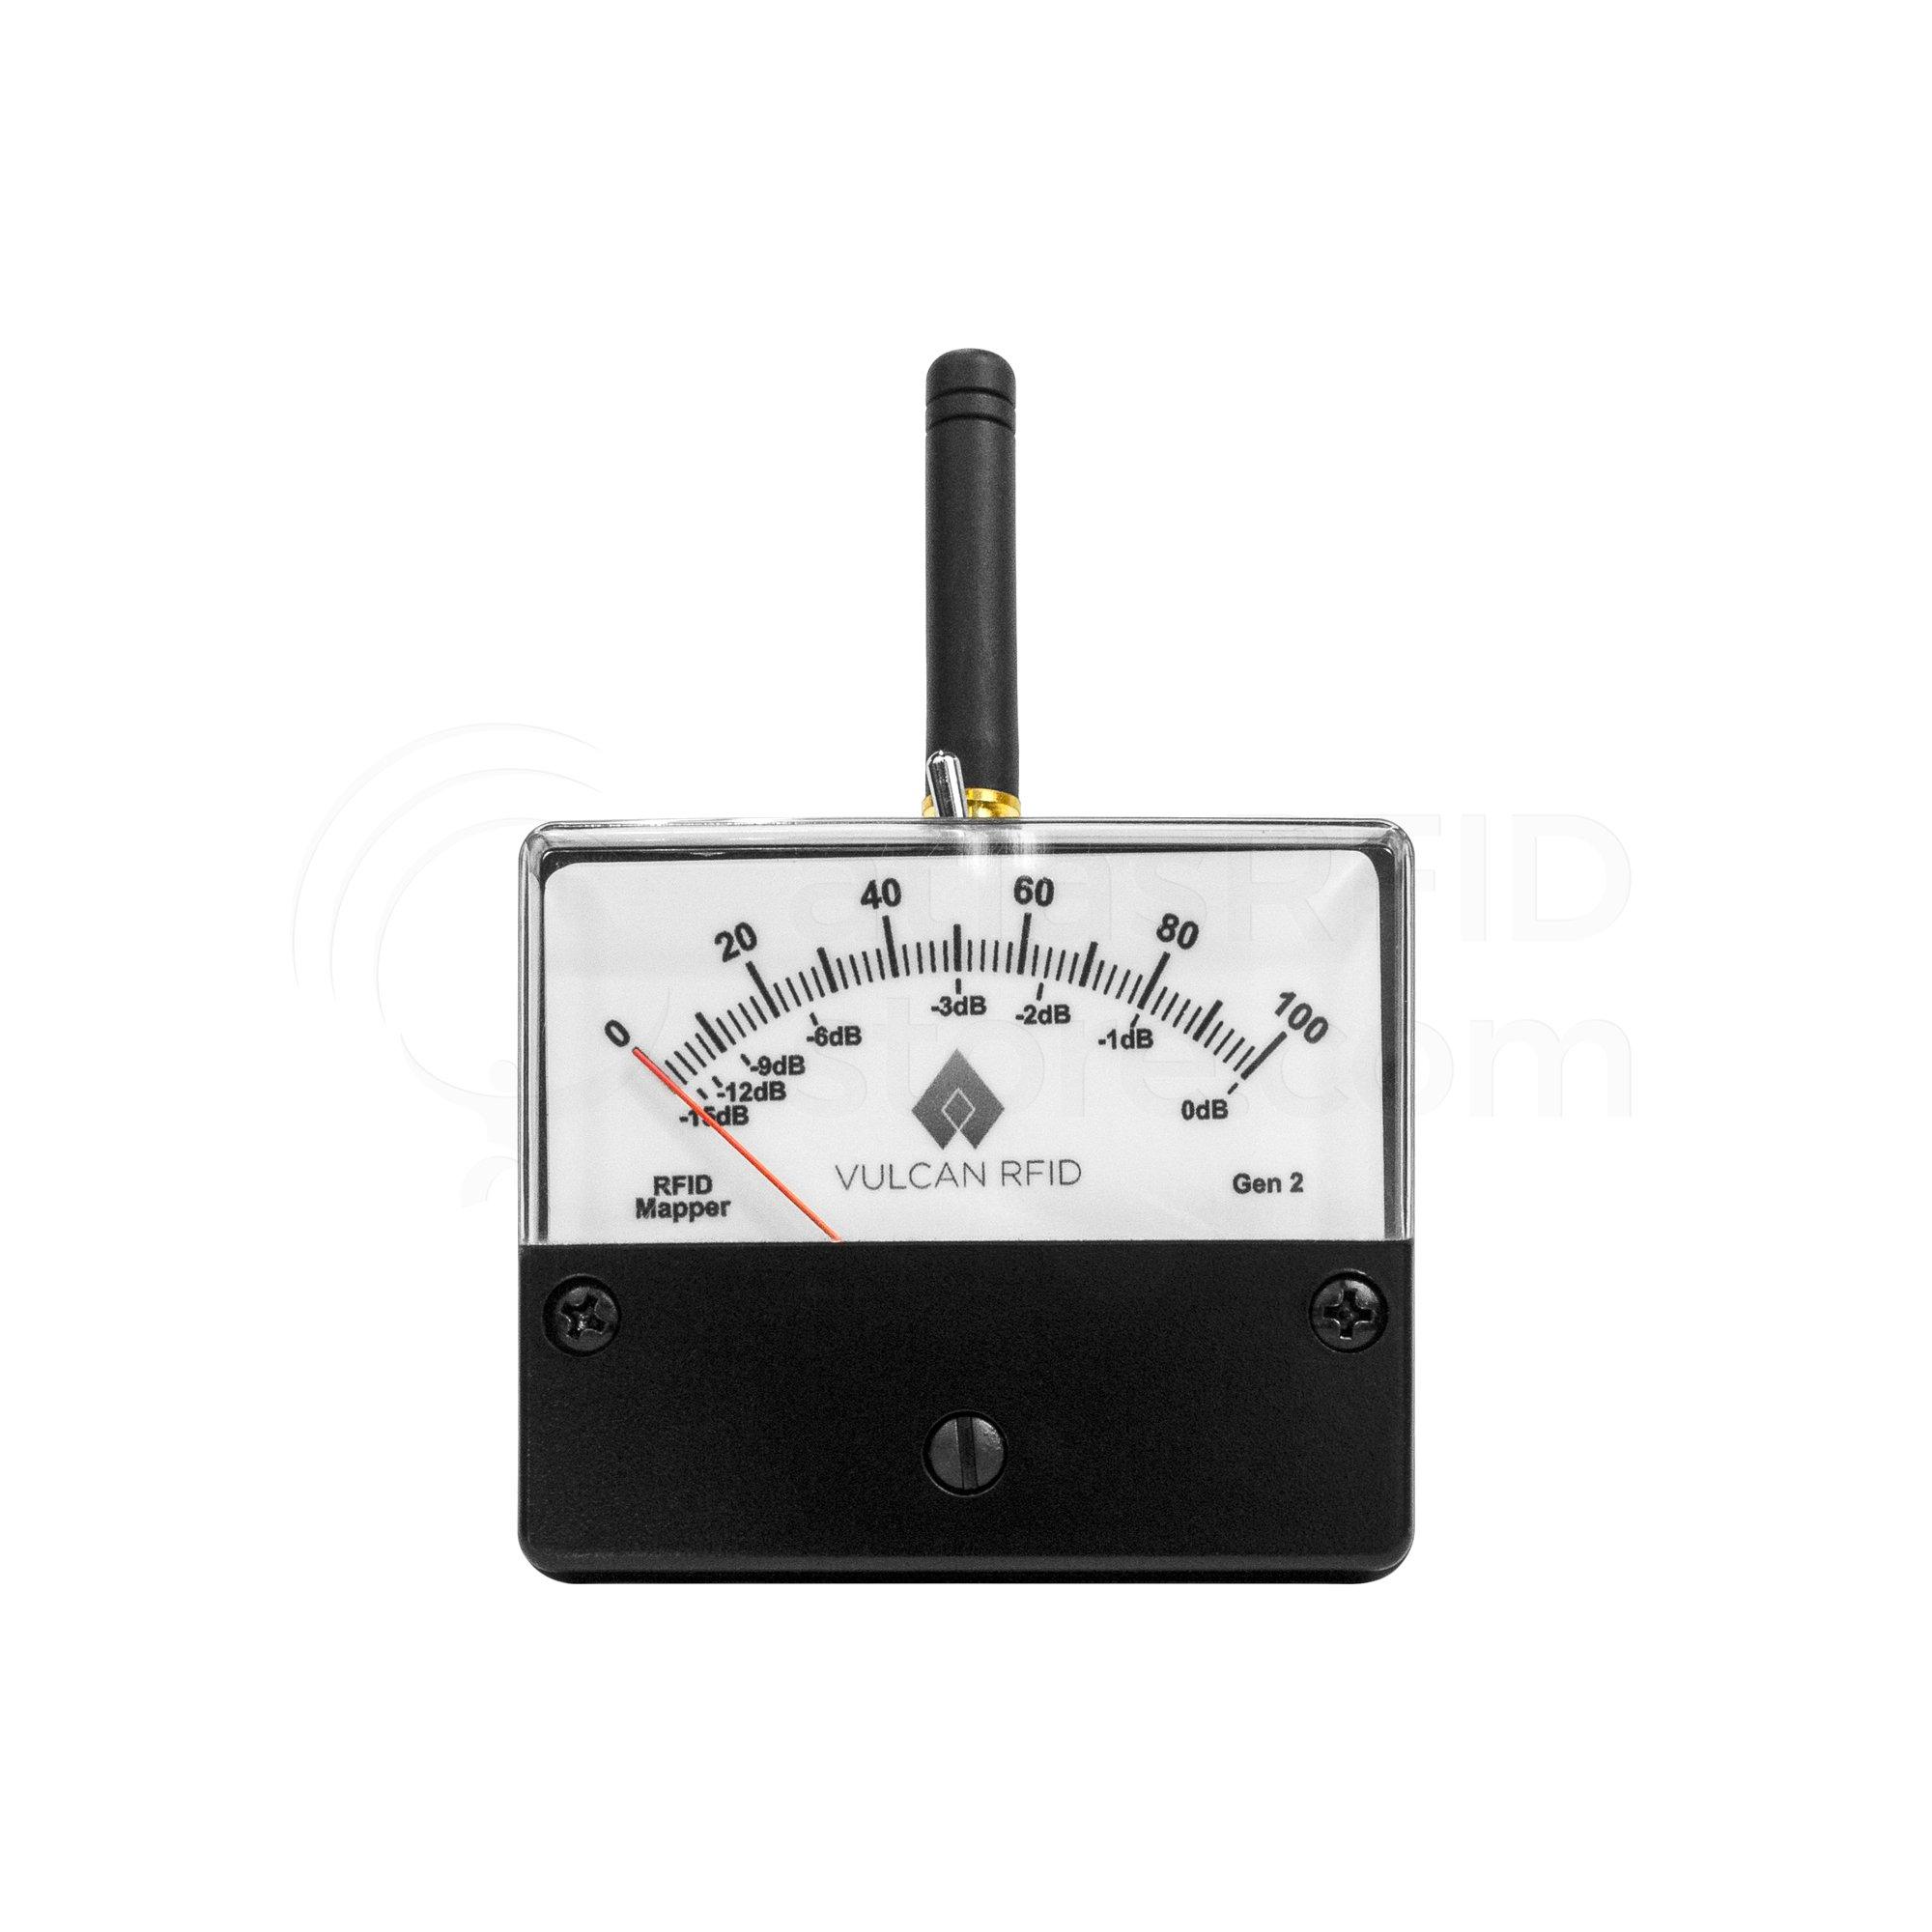 Vulcan RFID Power Mapper by Vulcan RFID